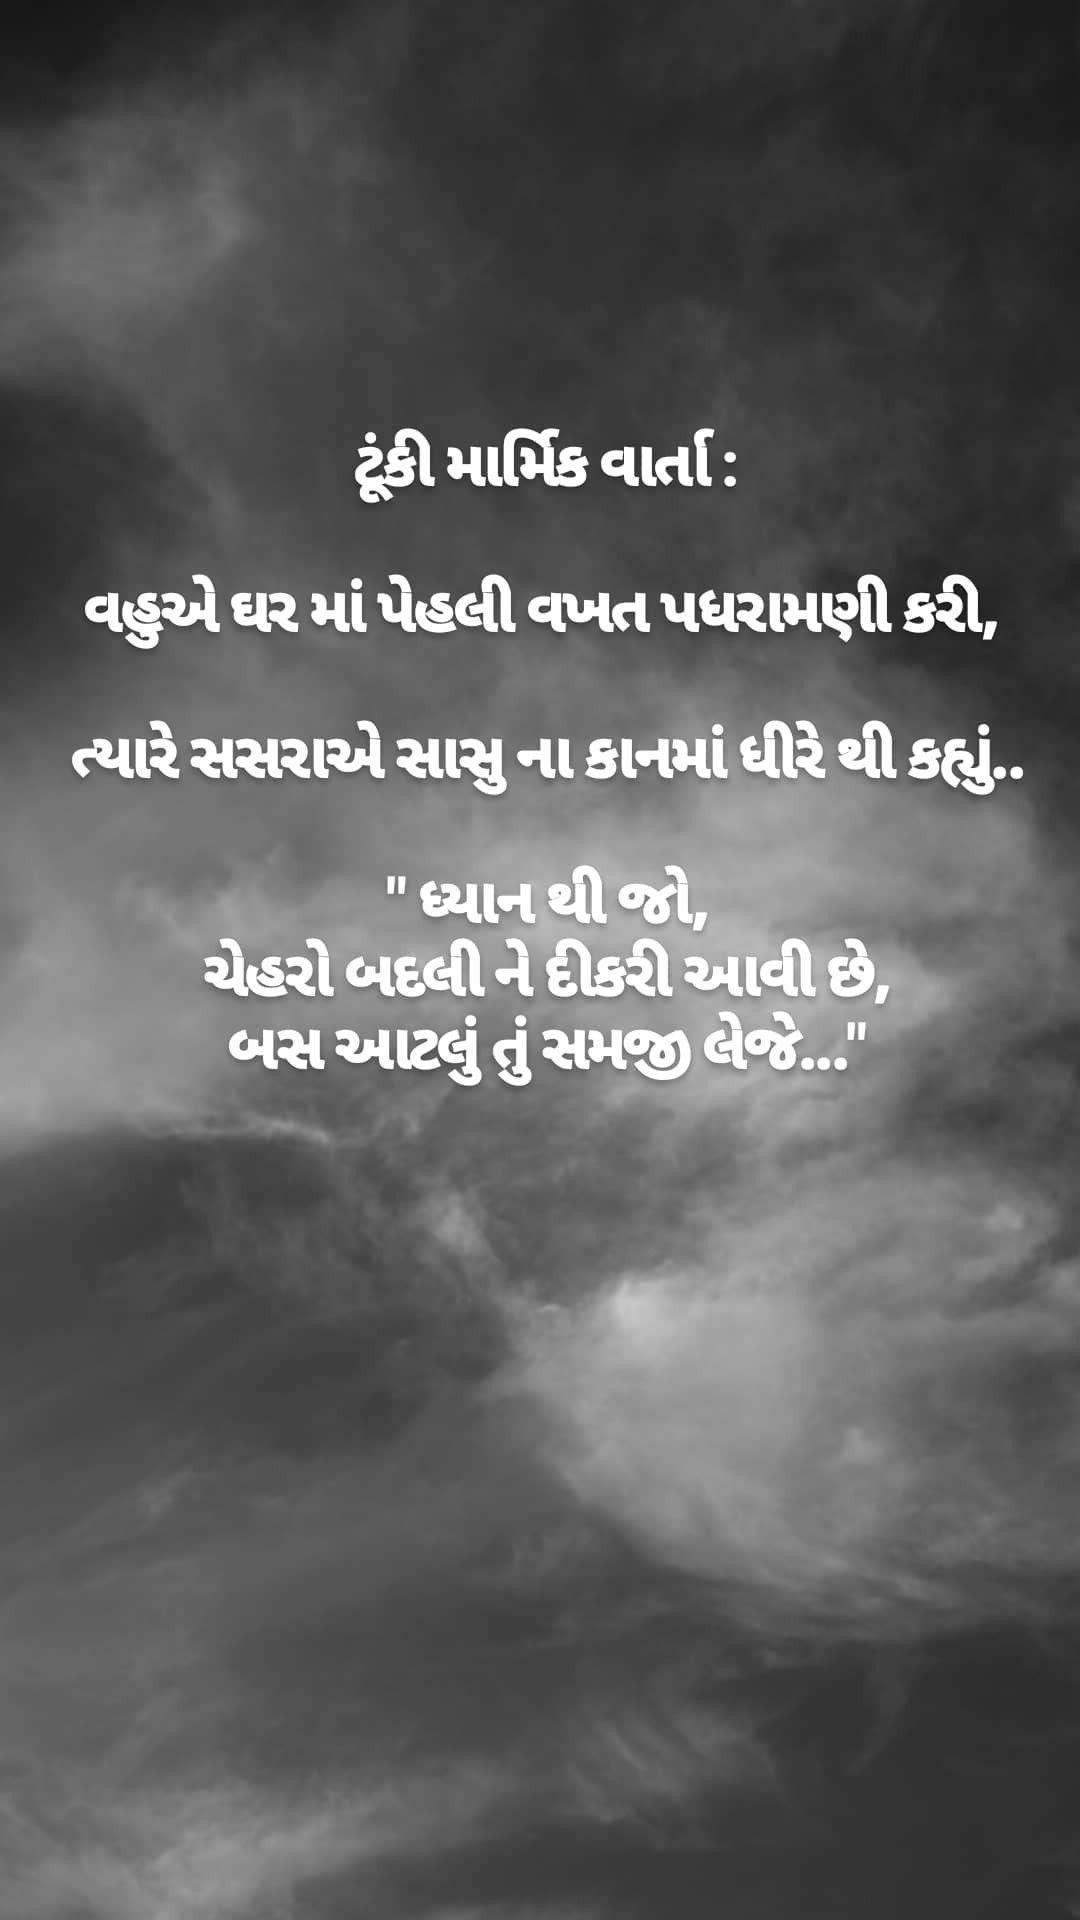 5+ Gujarati quotes ideas in 5  gujarati quotes, quotes, life